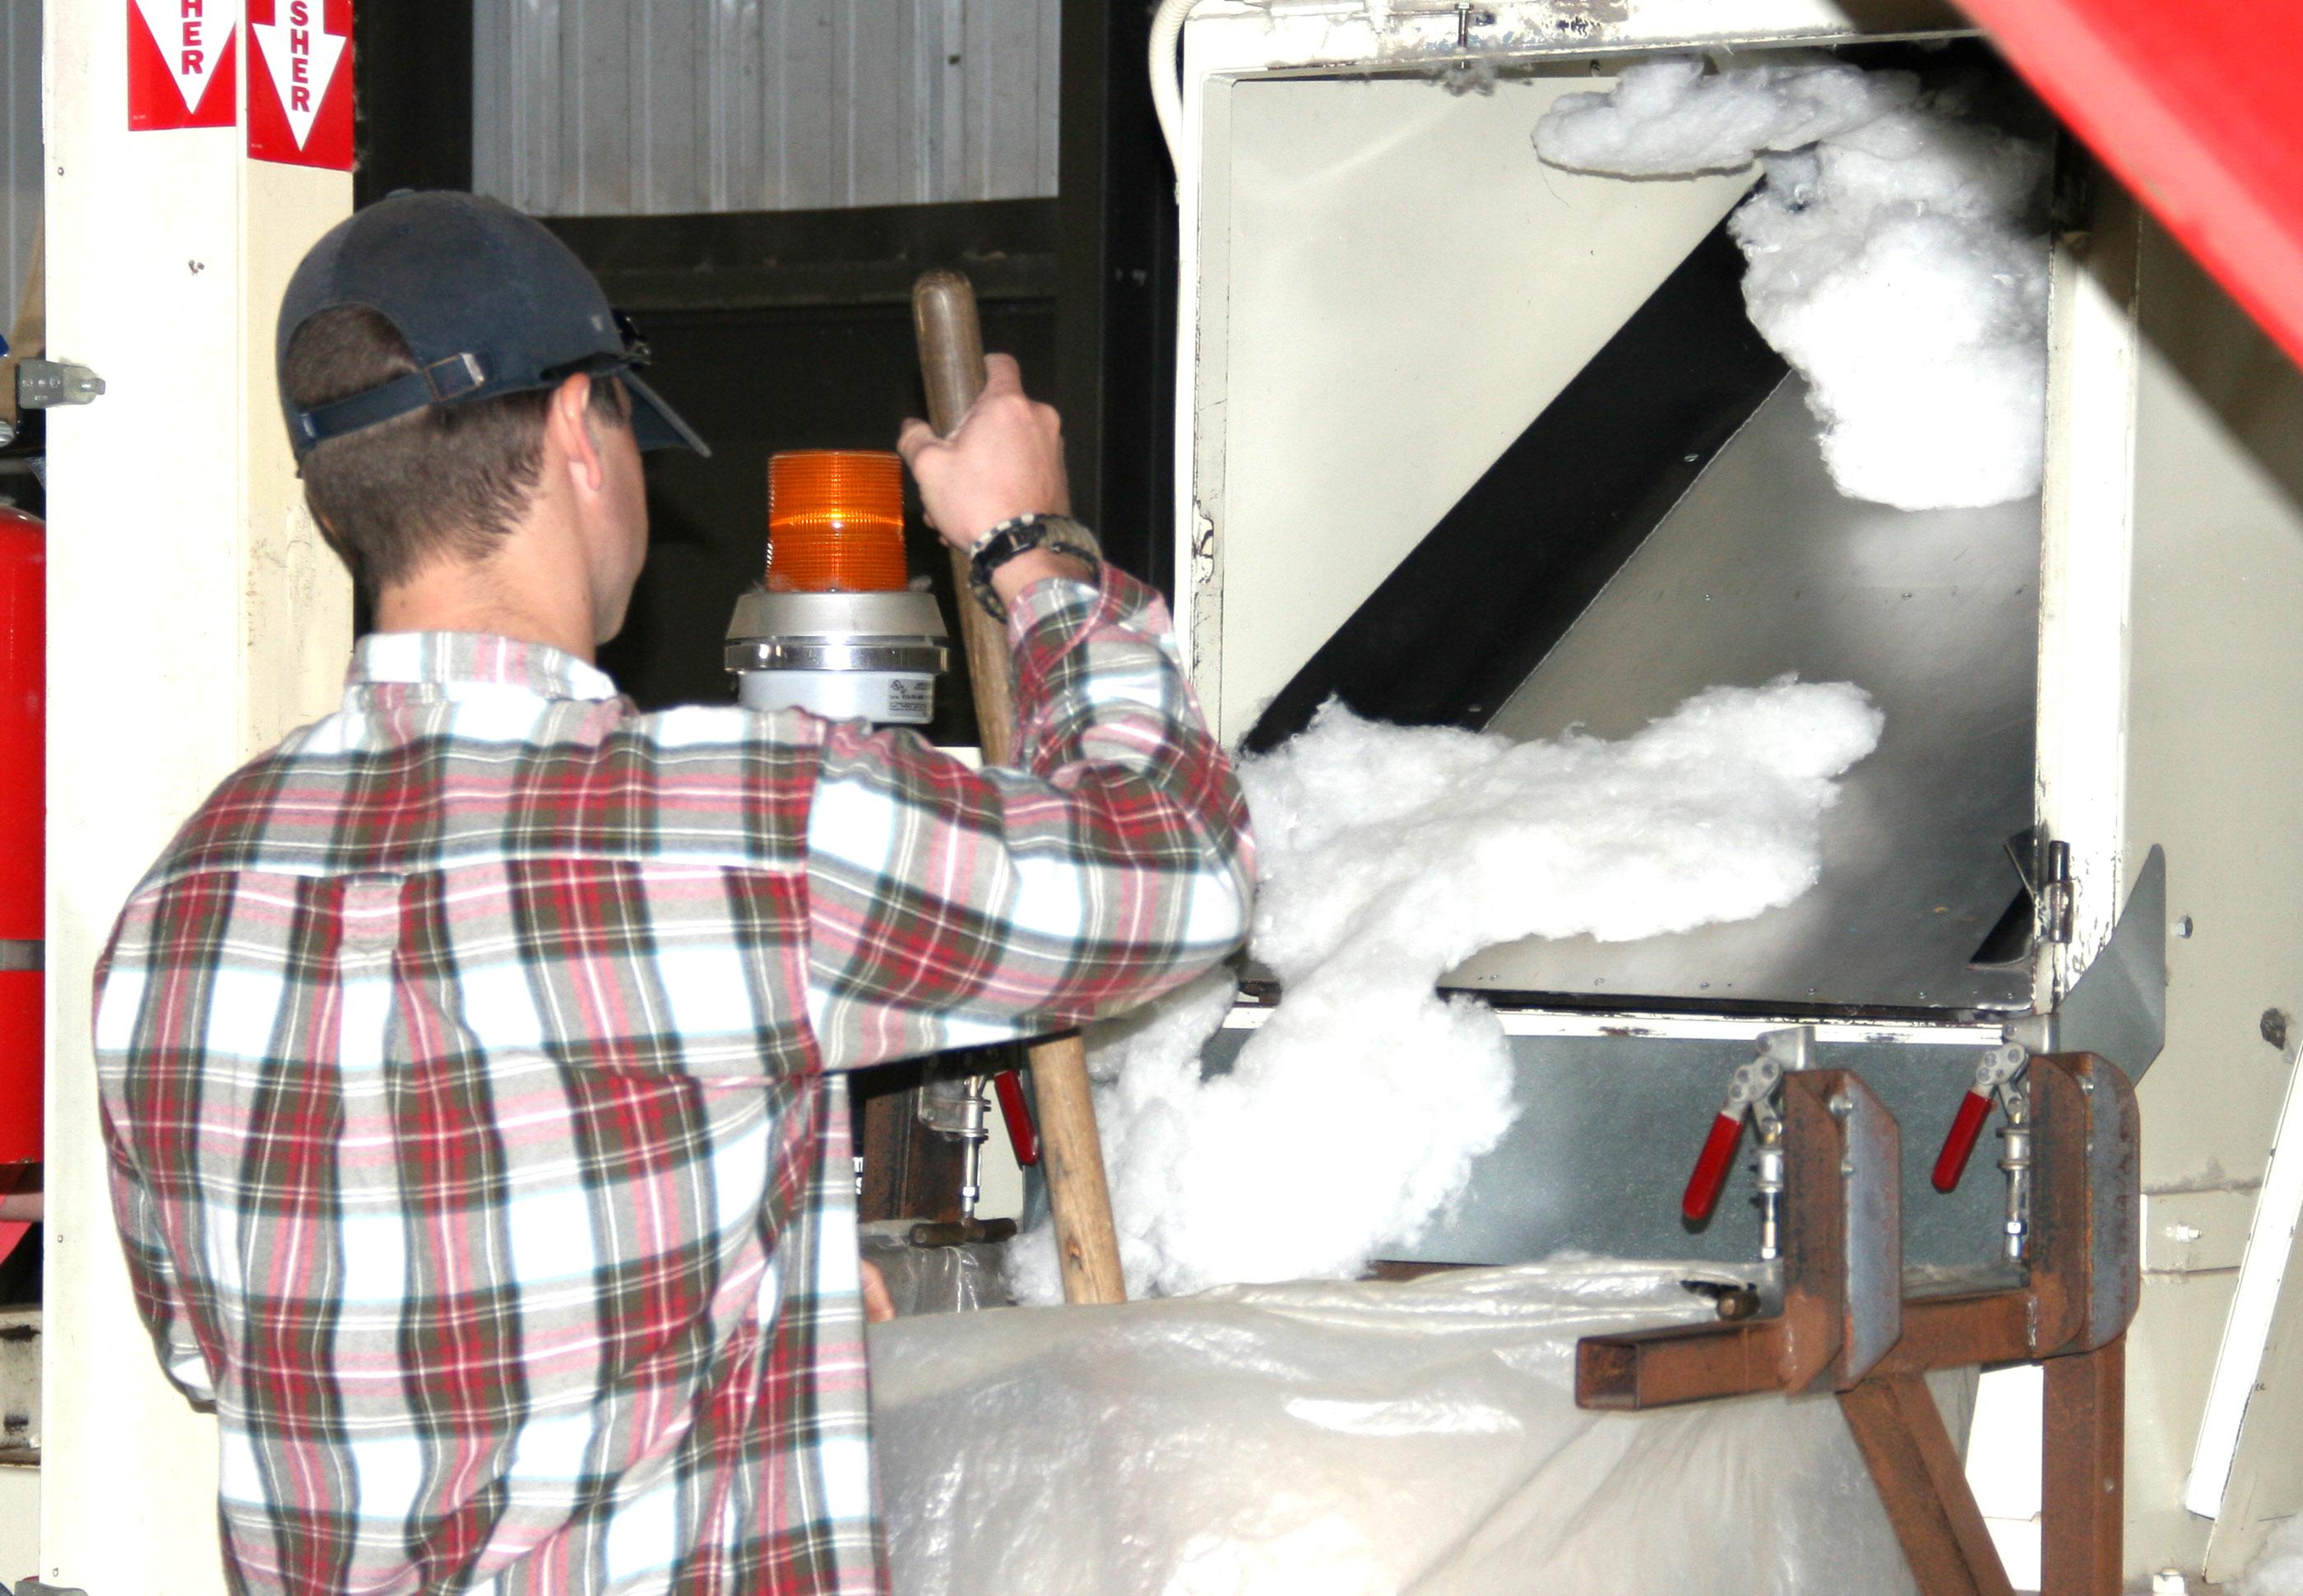 Cotton sampling is done at the UGA Tifton microgin.